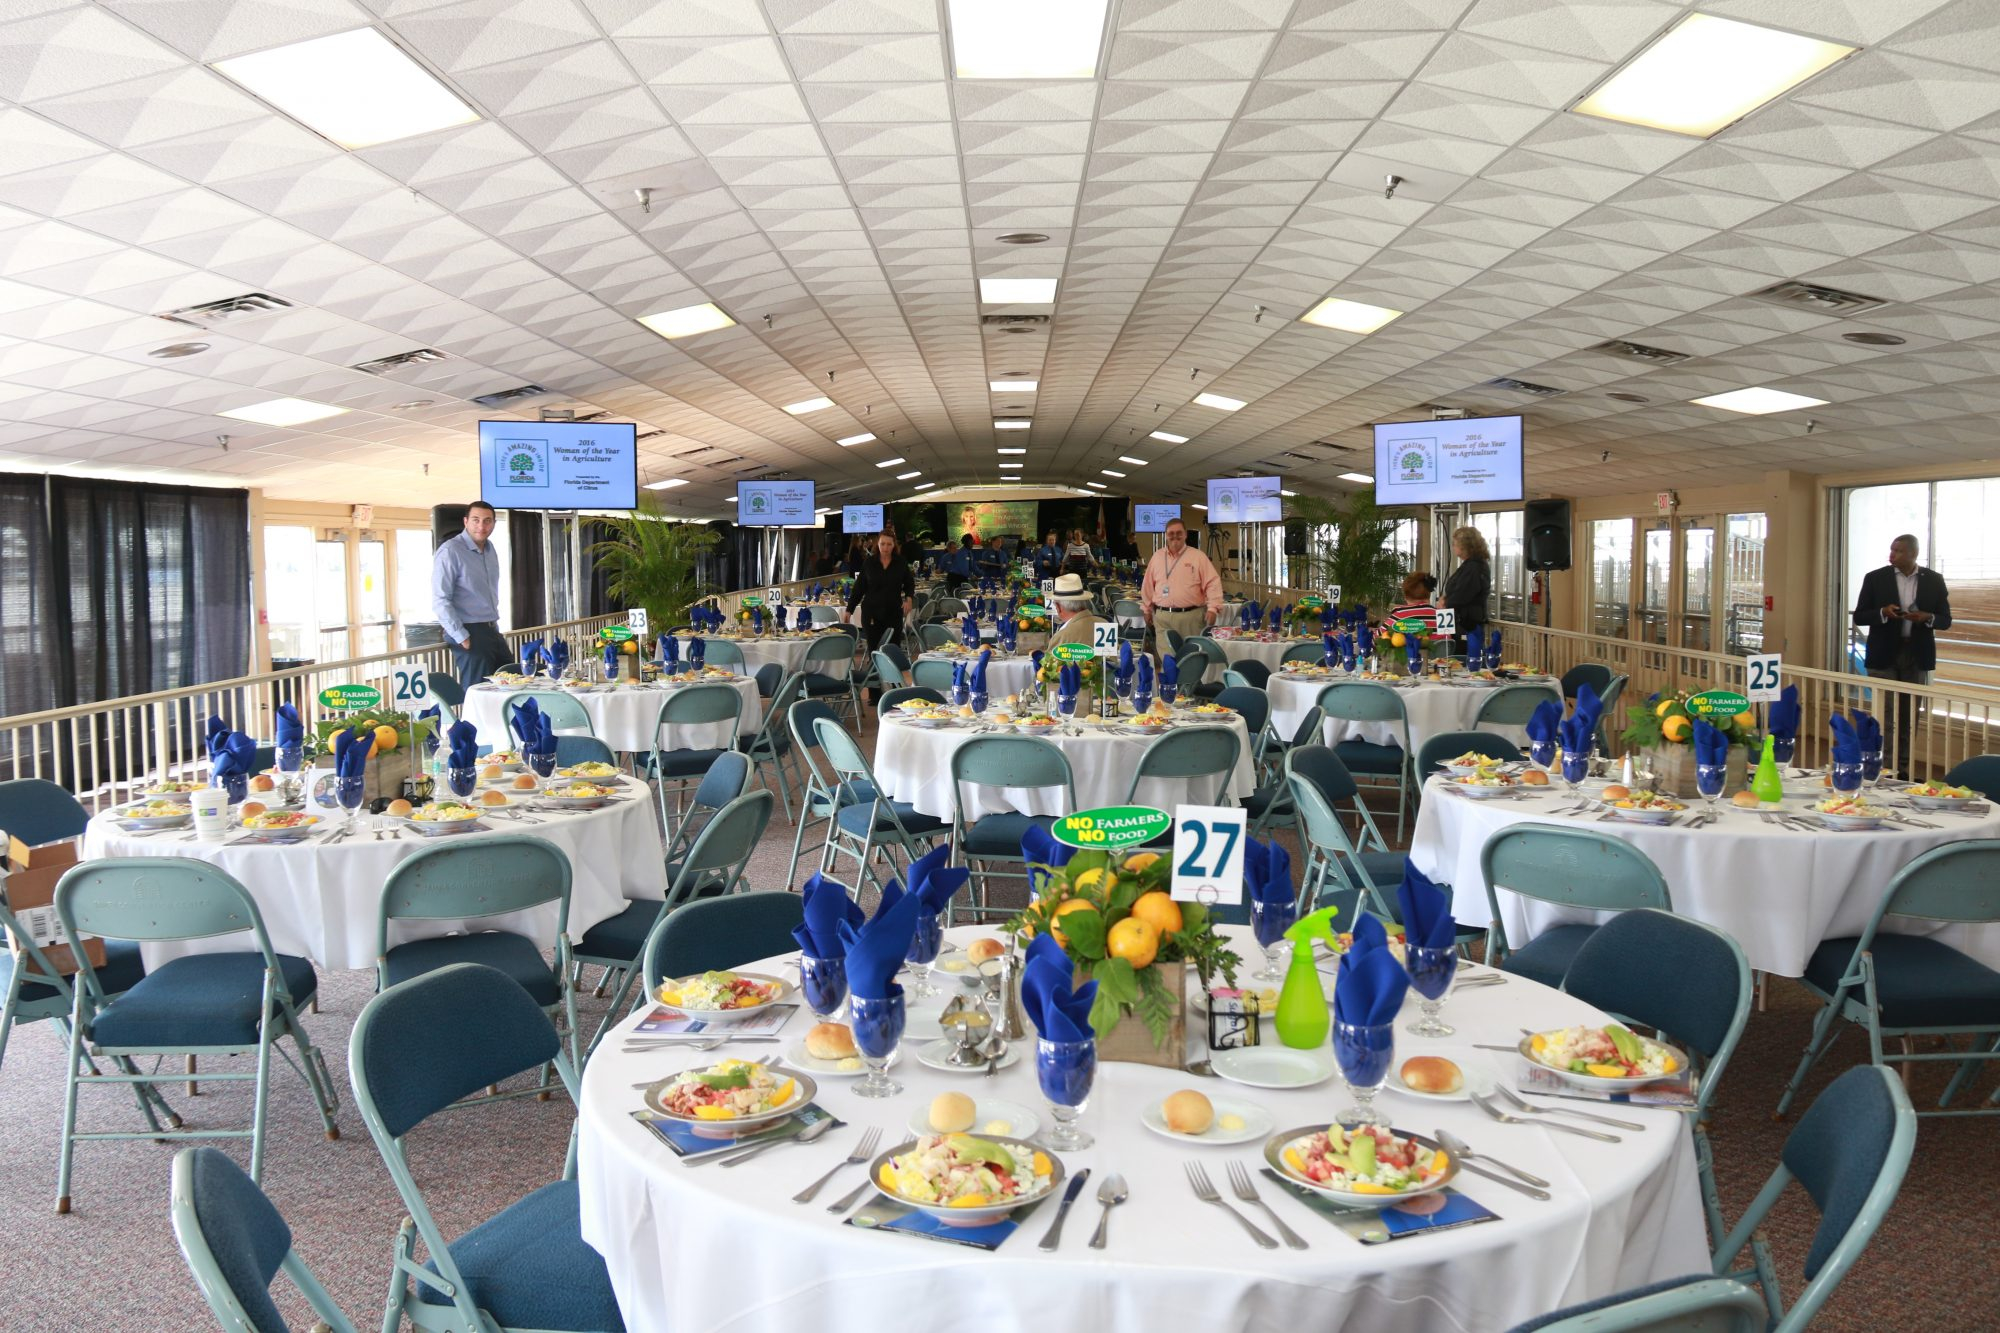 Equestrian – Florida State Fair Regarding Florida State Fairgrounds Events Calendar